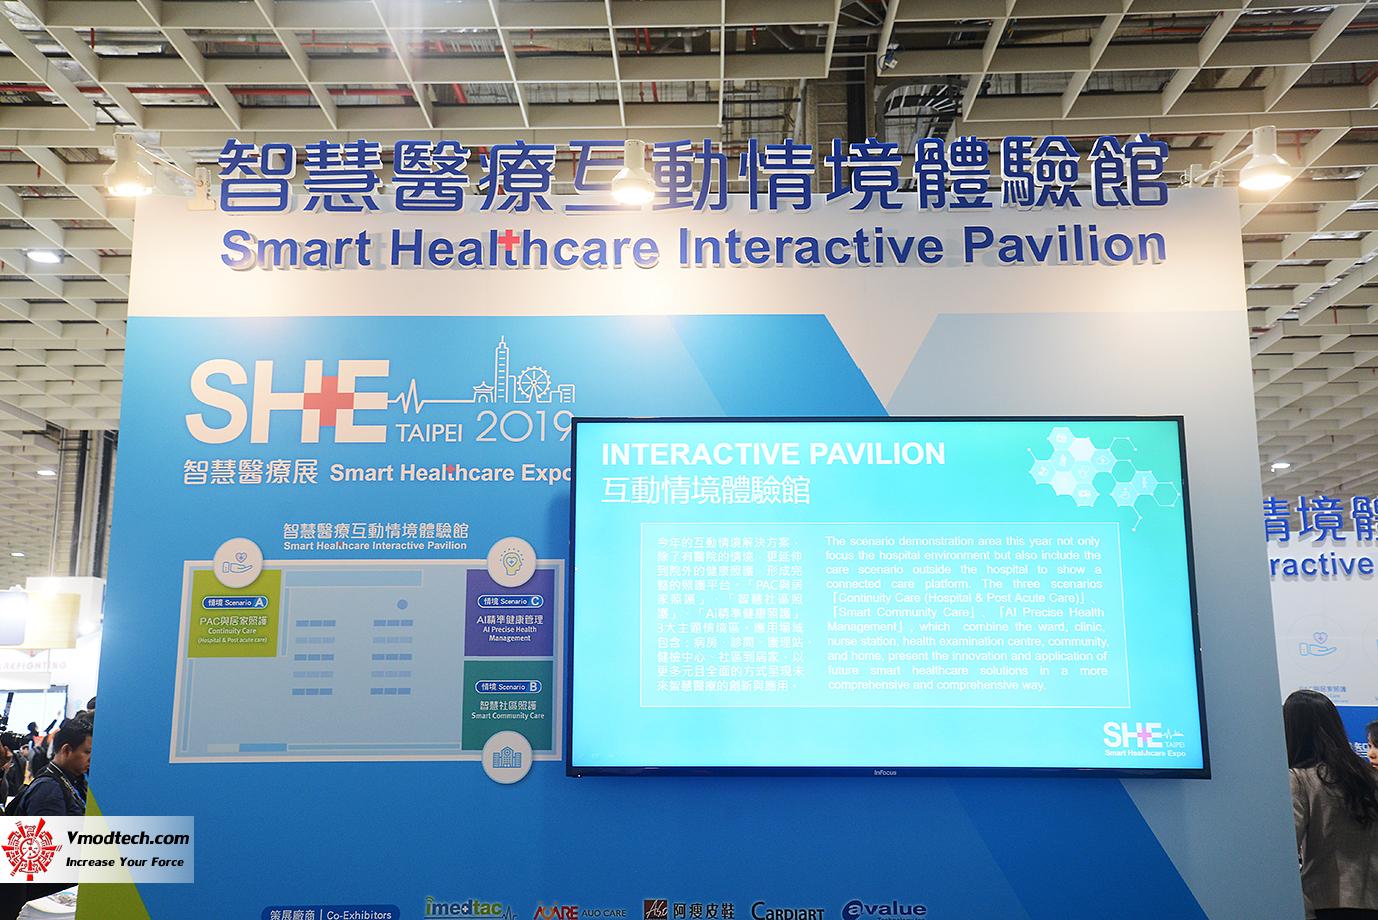 dsc 8722 เยี่ยมชมบูธ Smart Healthcare Expo กับเทคโนโลยีระบบการแพทย์และการดูแลสุขภาพอัจฉริยะในงาน 2019 SMART CITY SUMMIT & EXPO ณ กรุงไทเป ประเทศไต้หวัน